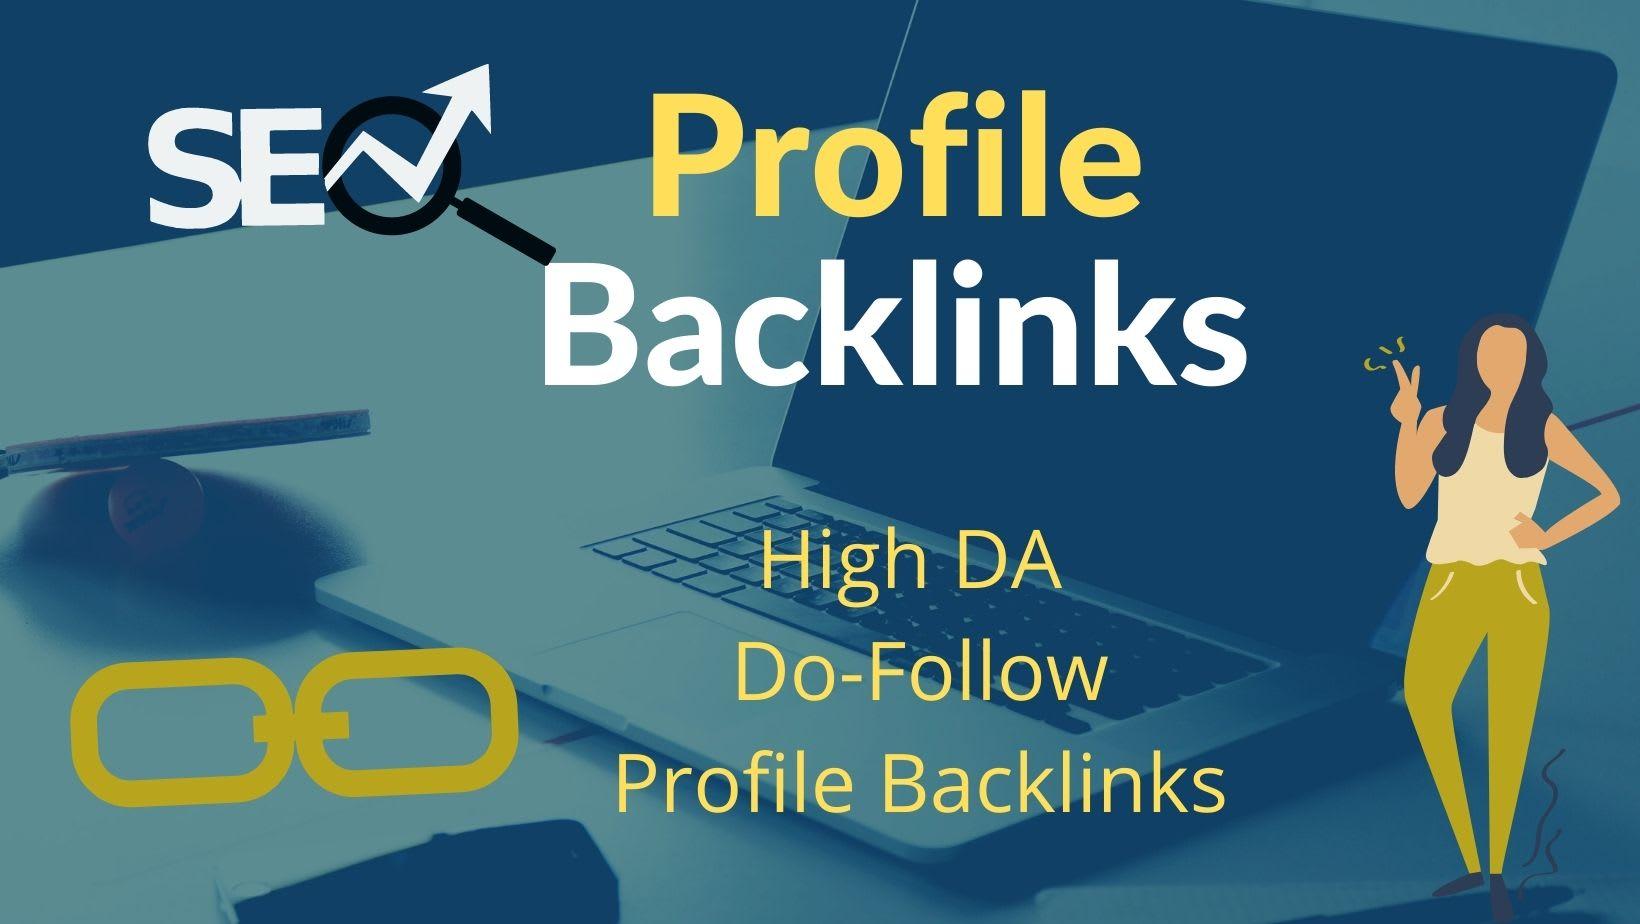 I Will Build 50+ profile backlinks high authority do follow links building